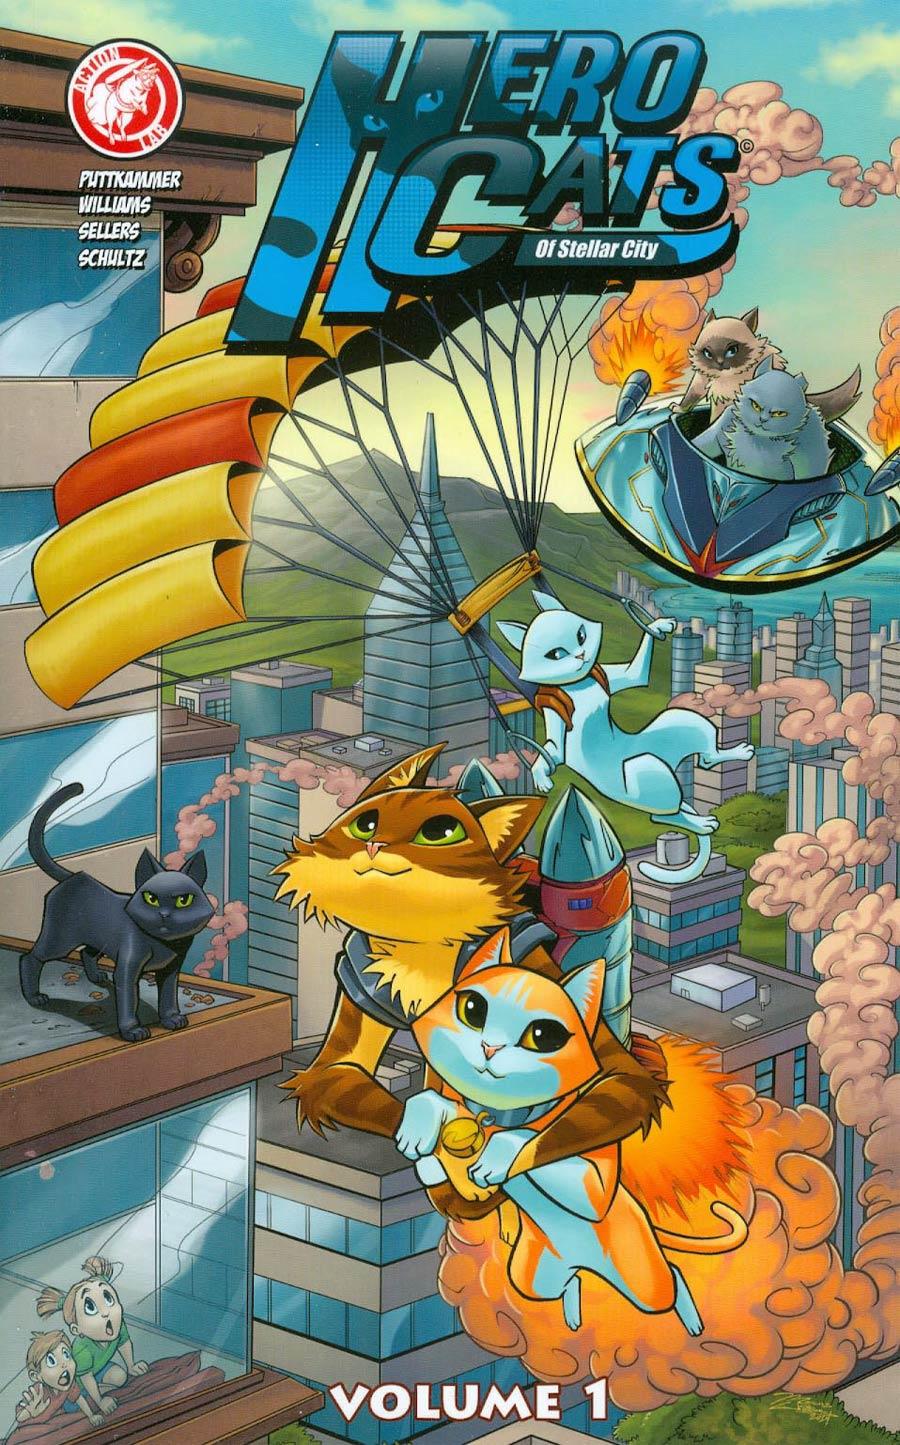 Hero Cats Of Stellar City Vol 1 TP